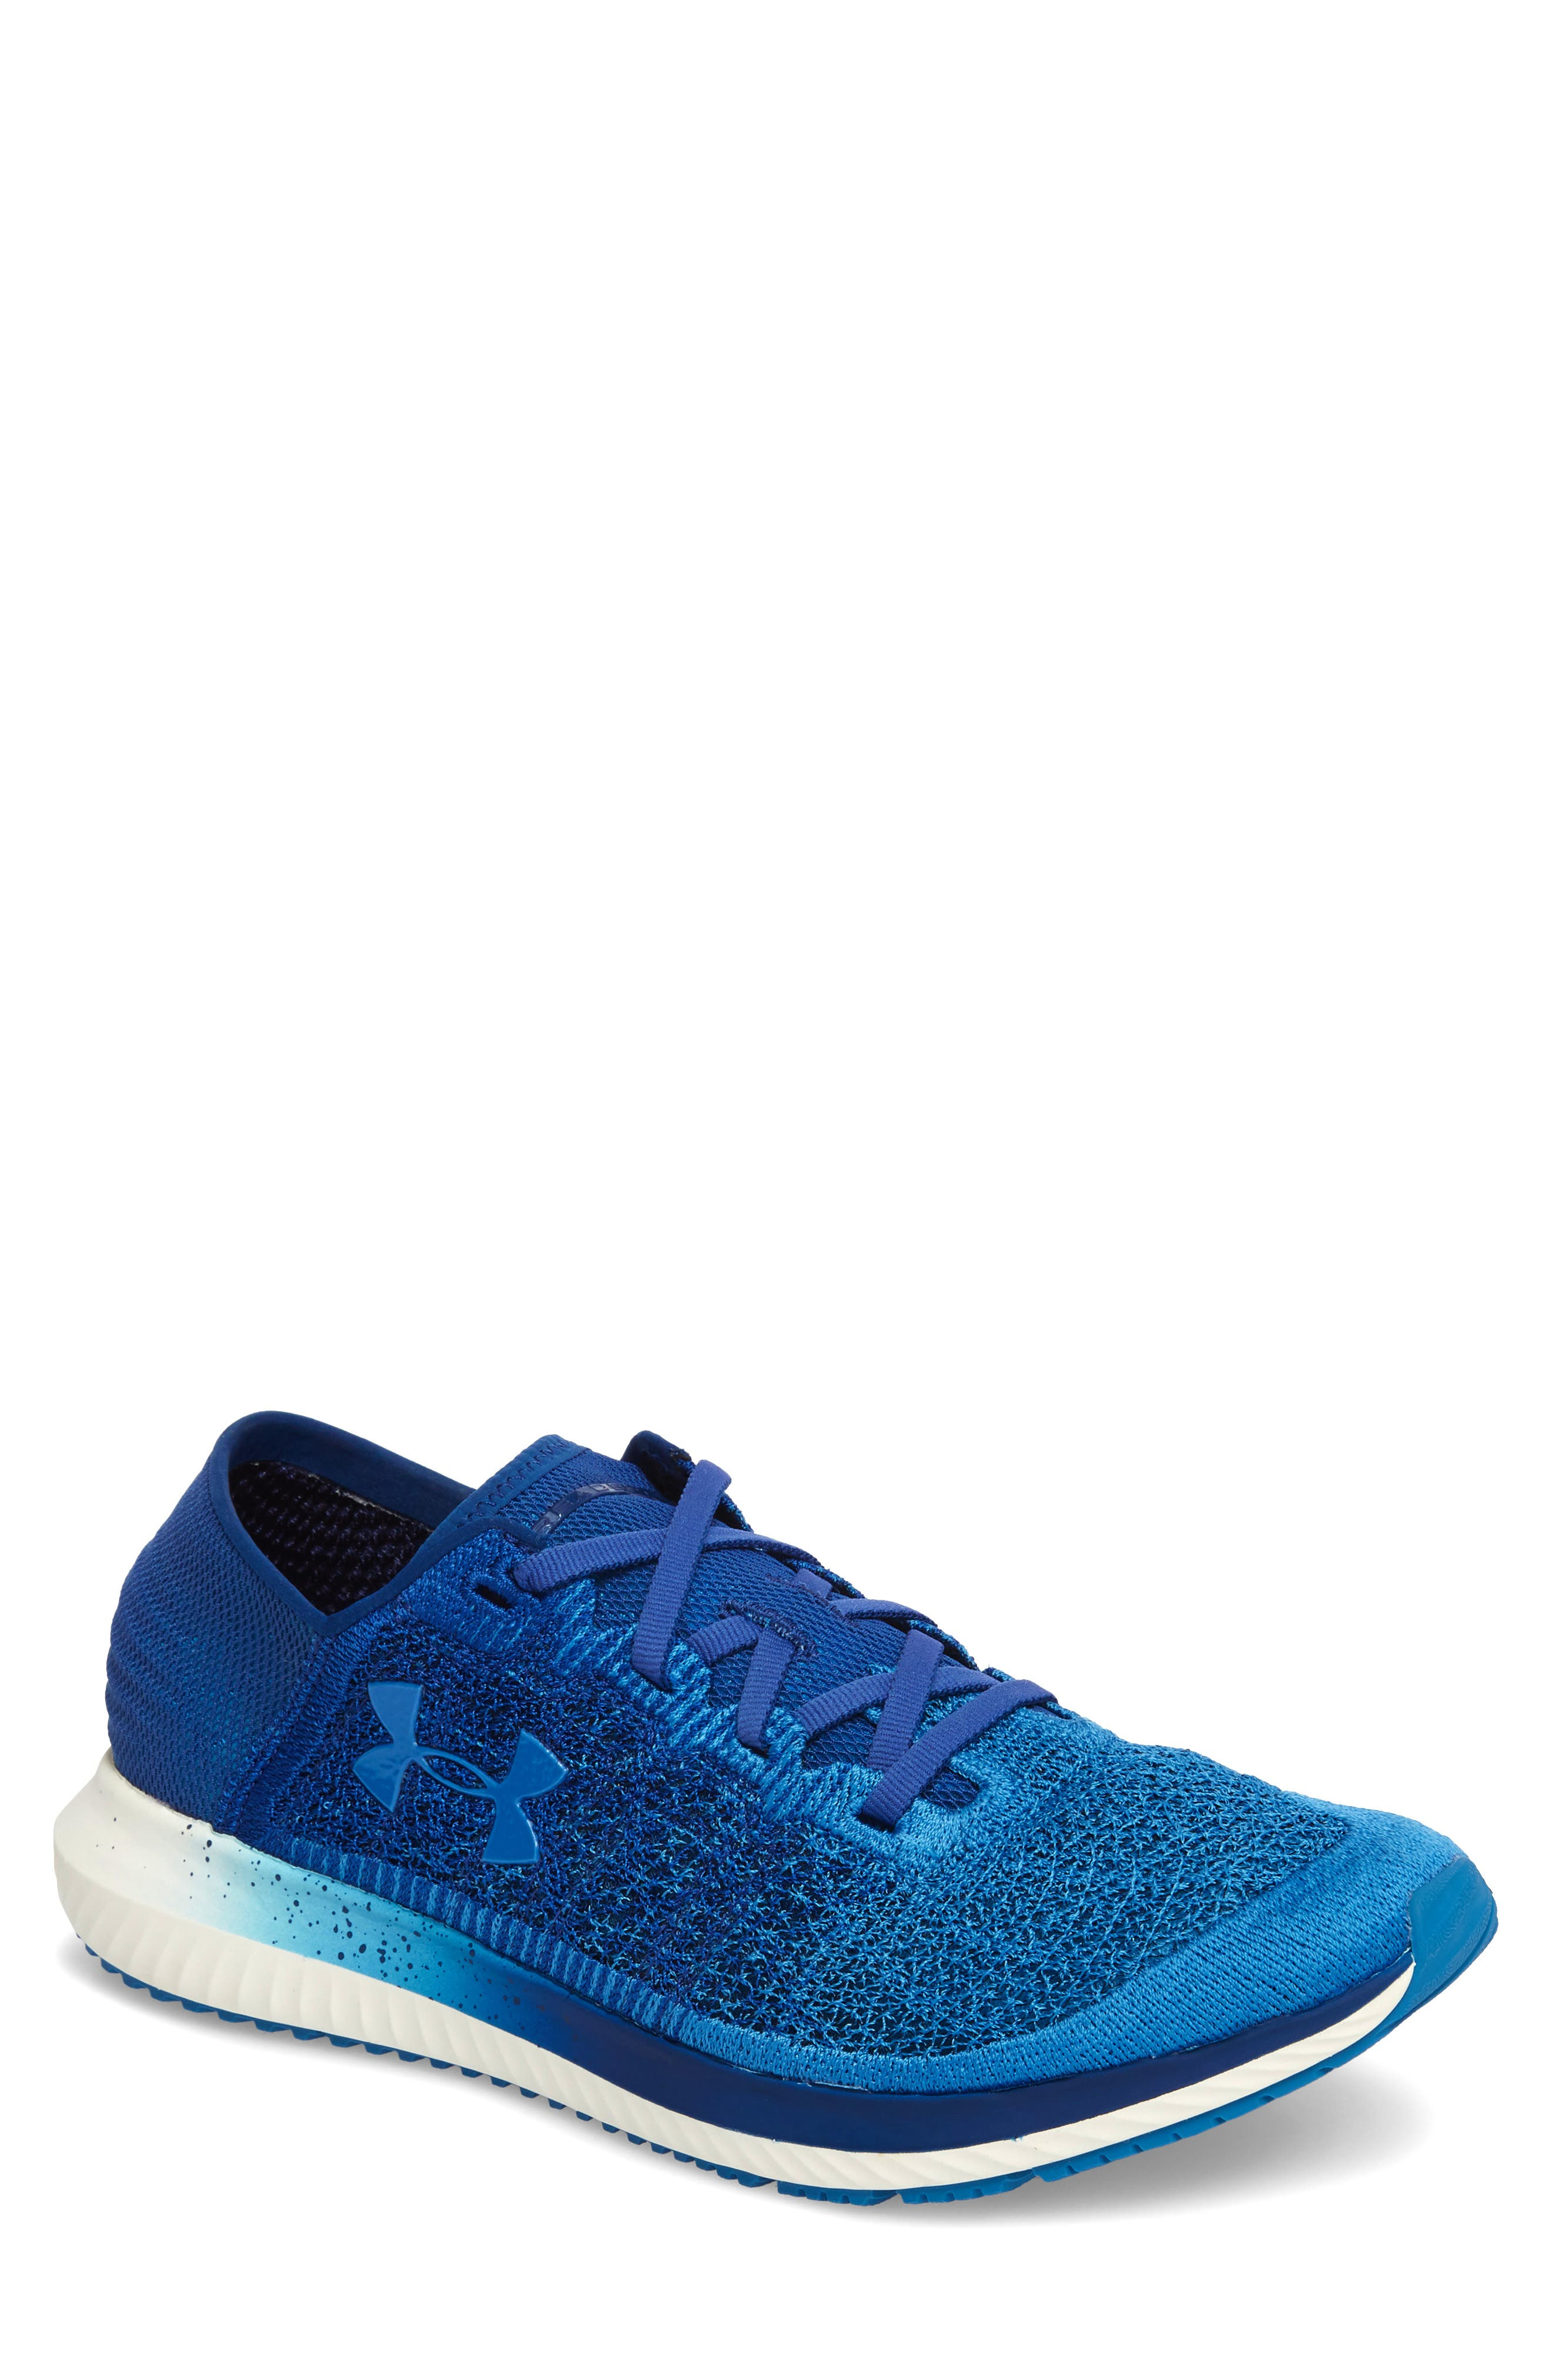 Threadborne Blur Running Shoe,                         Main,                         color, BLUE / STUDIO